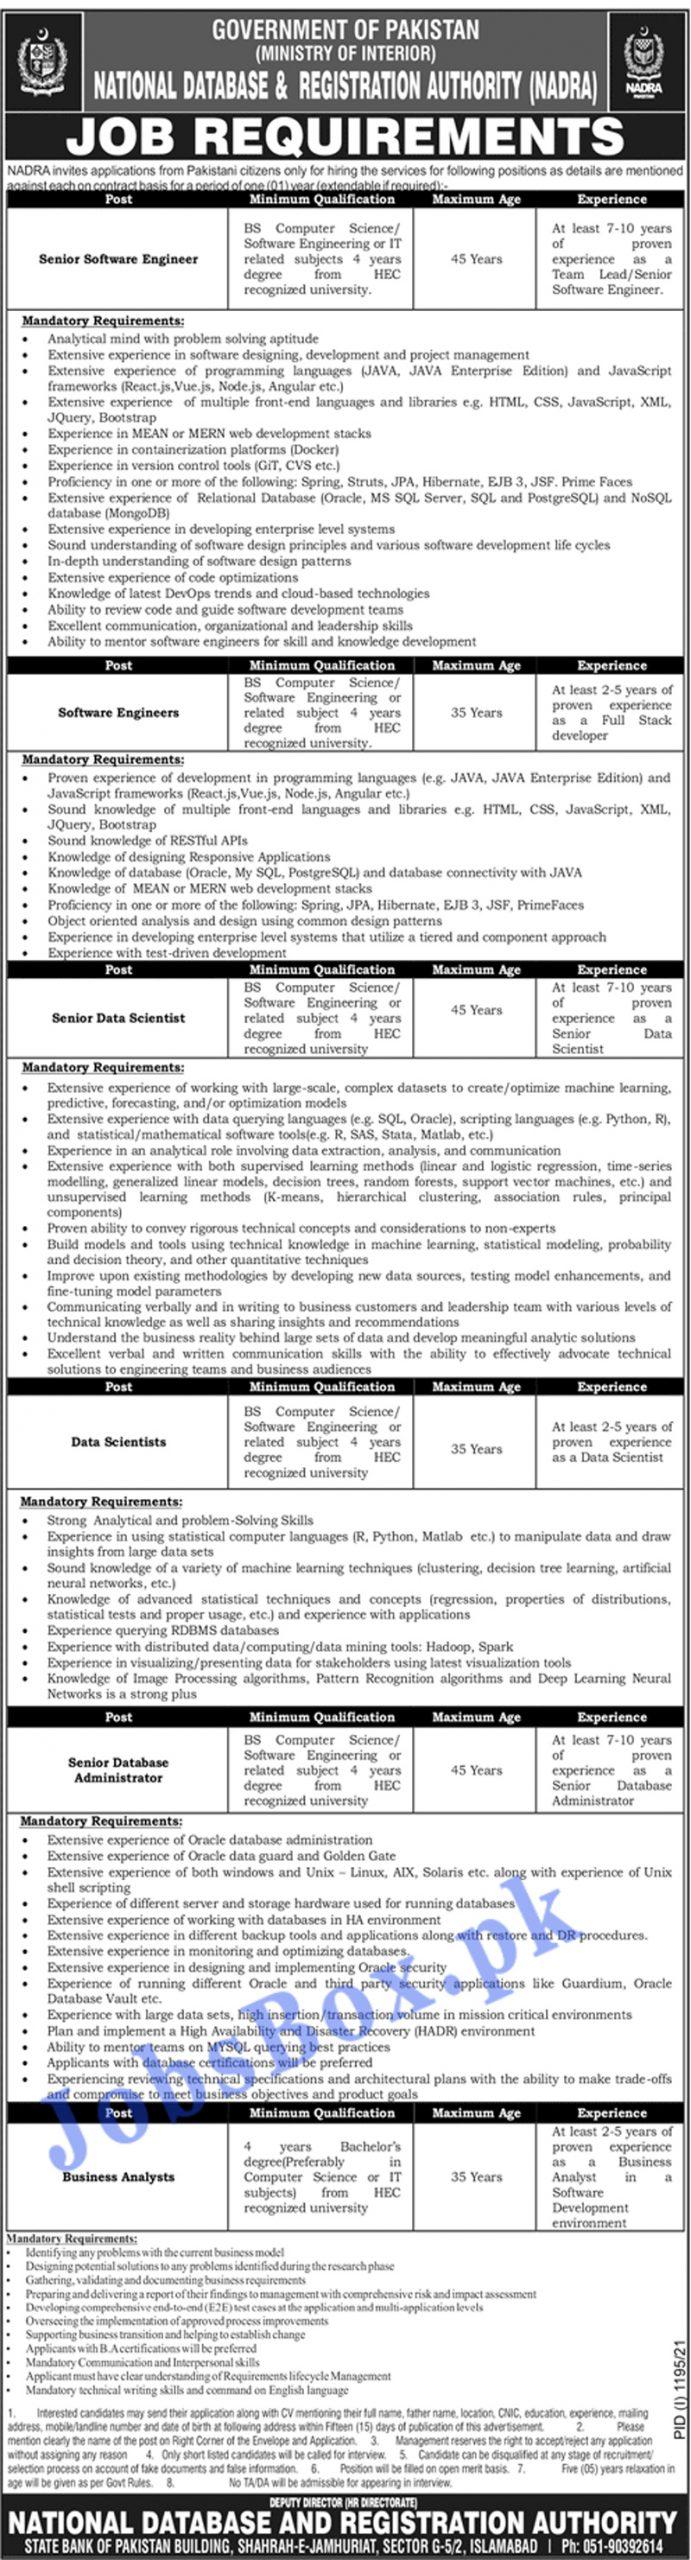 Ministry of Interior NADRA Islamabad Jobs 2021 Latest Recruitment